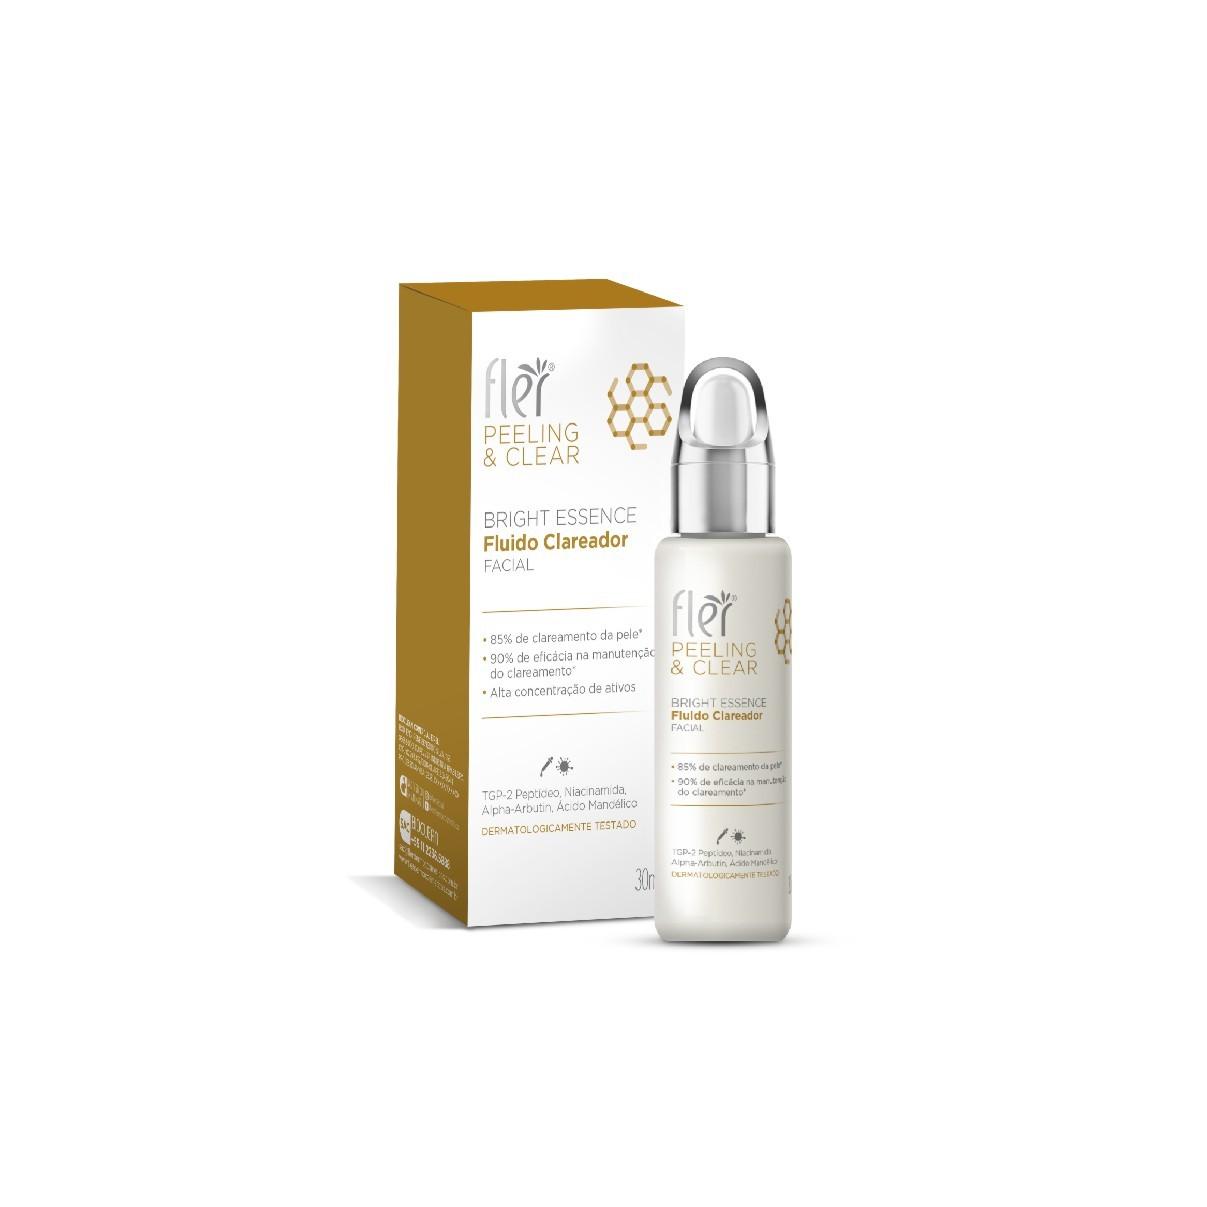 Peeling & Clear Fluído Clareador Bright Essence 30 ml - Fler